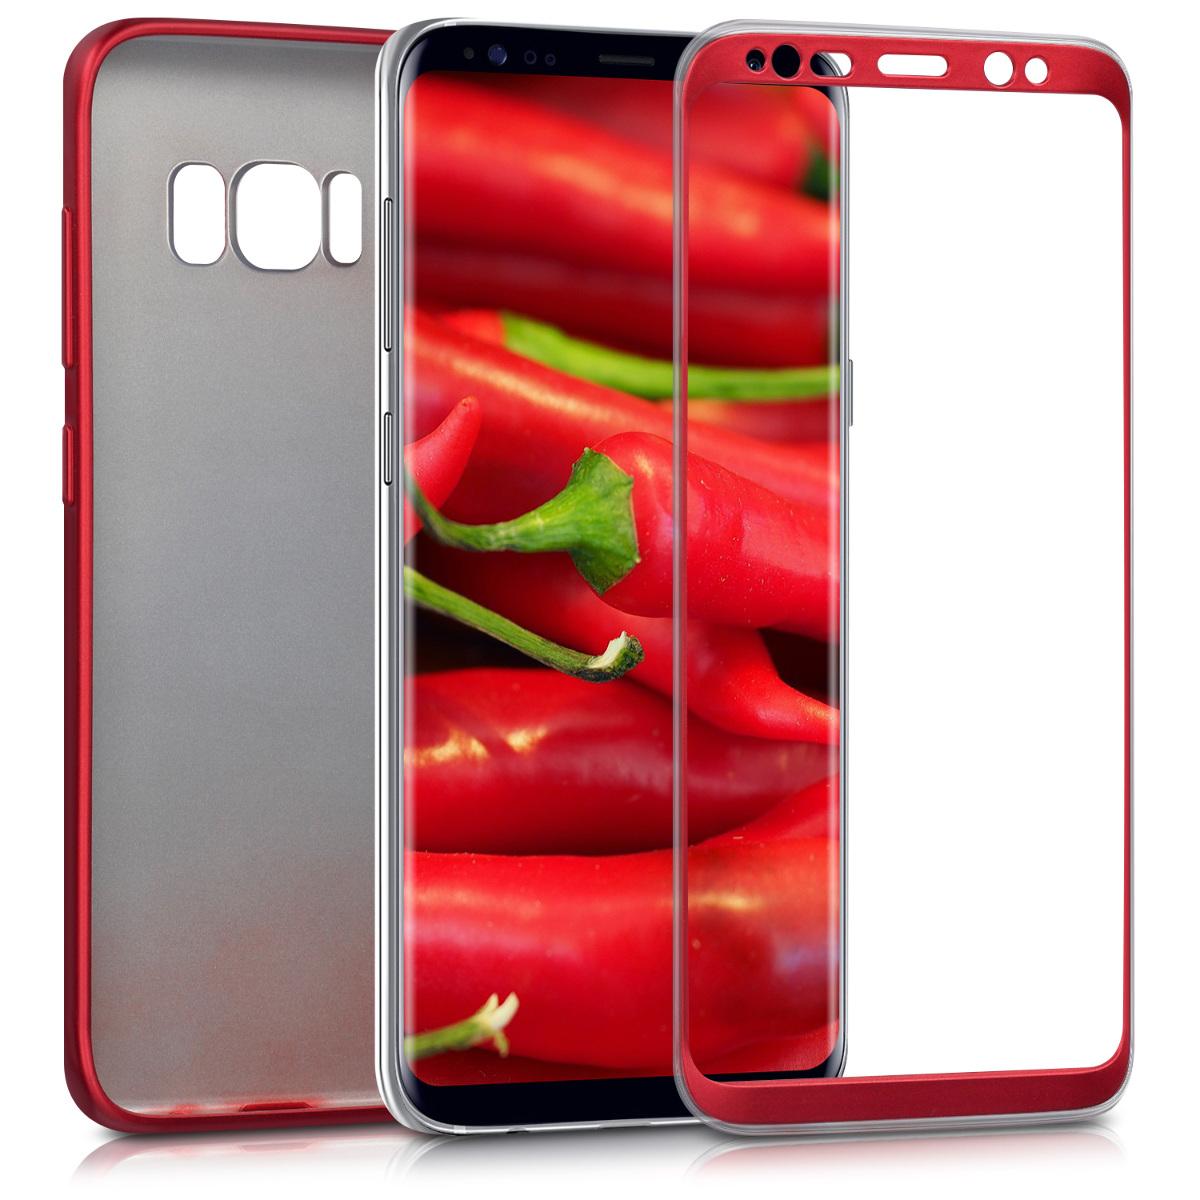 KW Θήκη Σιλικόνης Full Body Samsung Galaxy S8 - Κόκκινο μεταλλικό (41805.36)